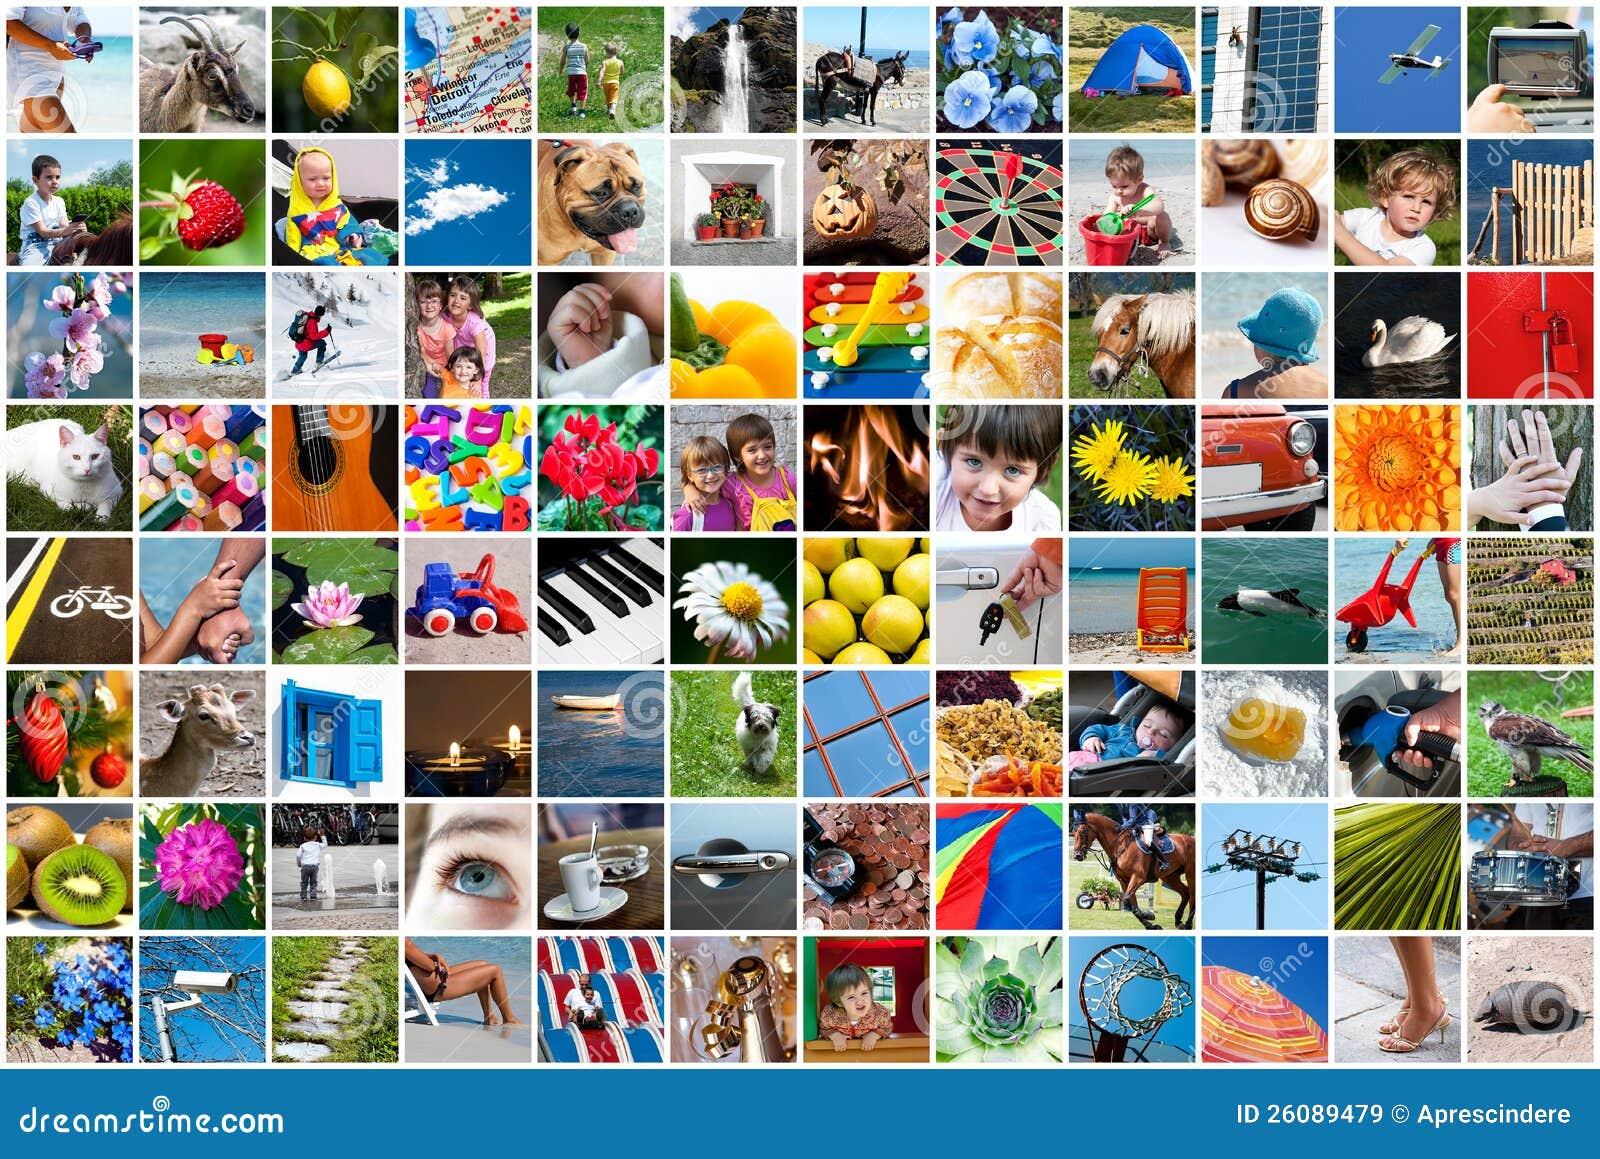 wallpaper collage maker app